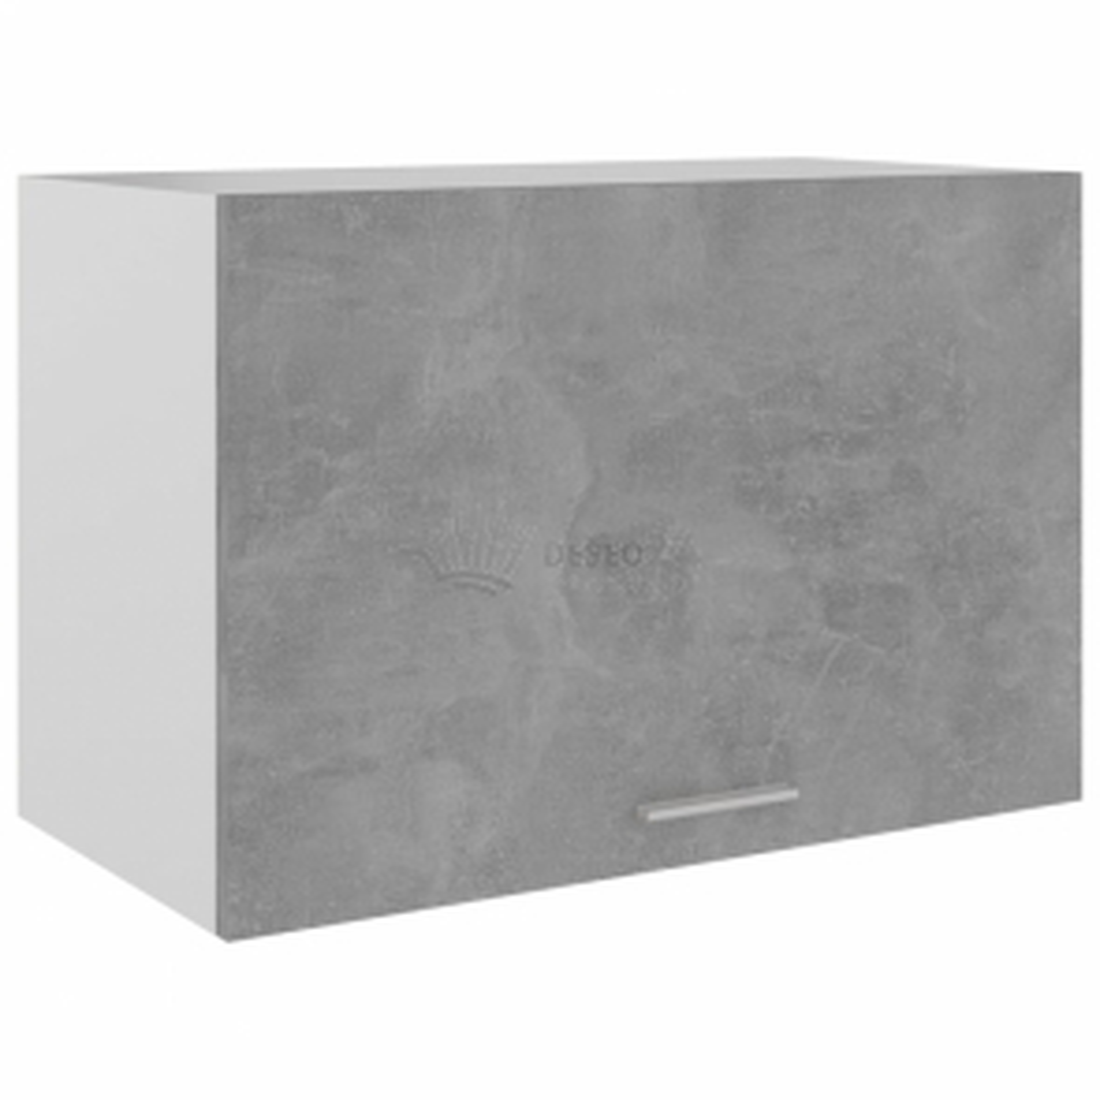 vidaXL Závěsná skříňka betonově šedá 60 x 31 x 40 cm dřevotříska [802517]